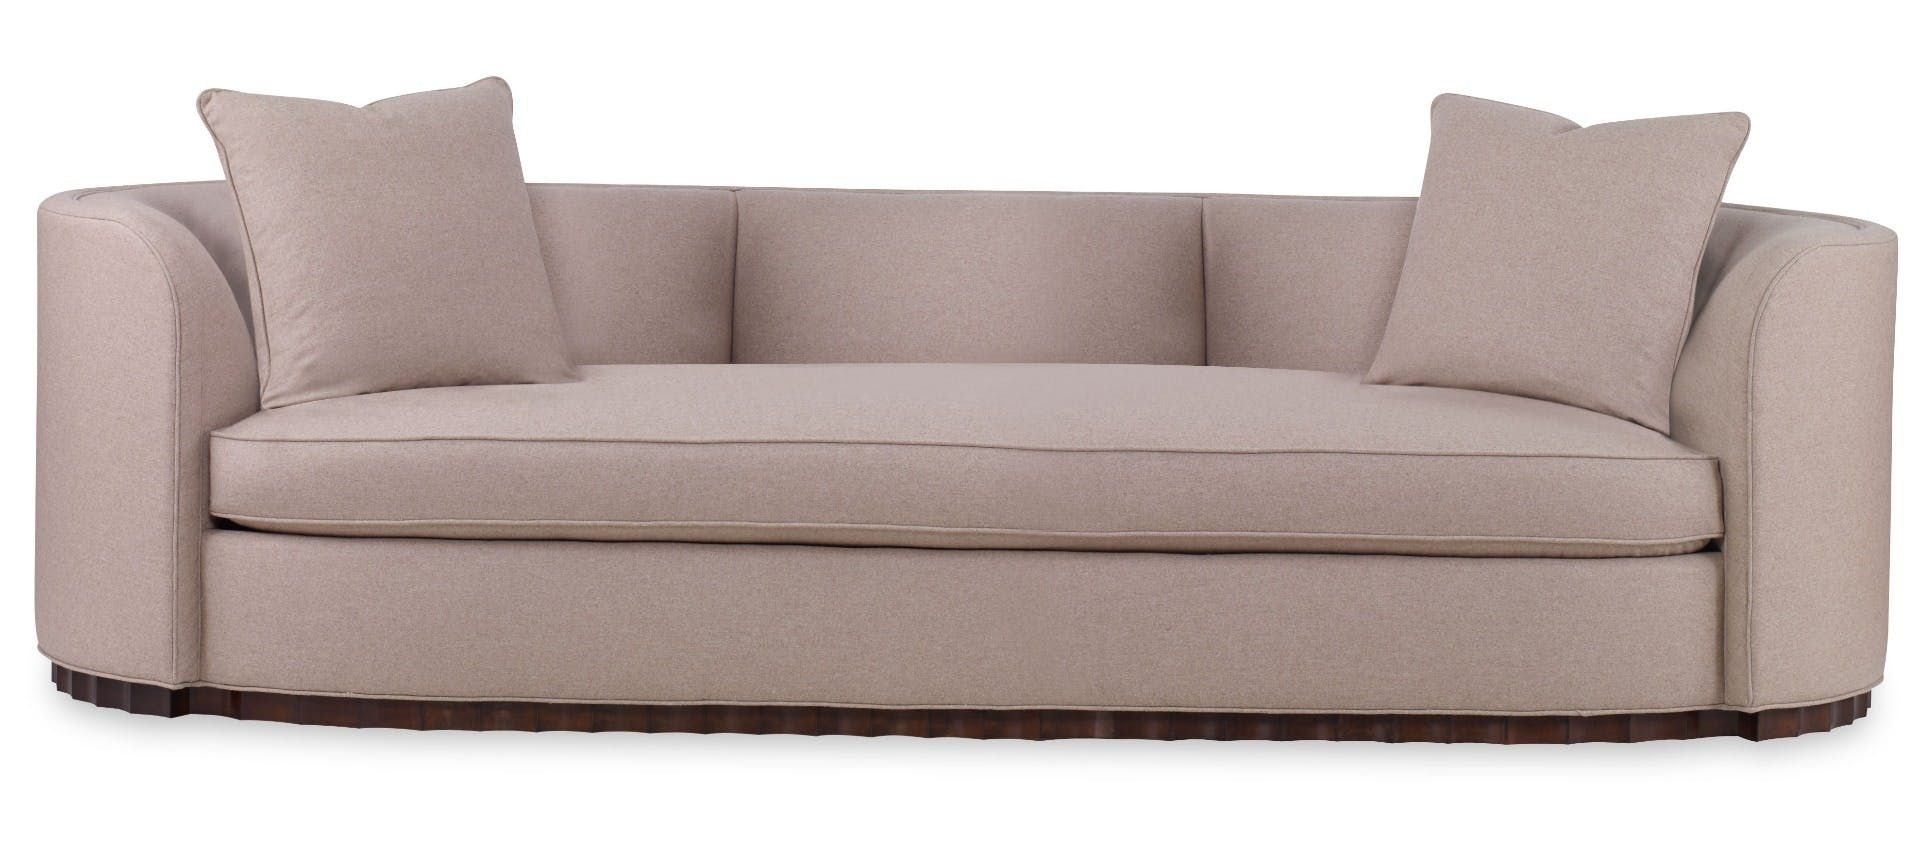 Miraculous Cuddle Up Furniture Kravet Sofa Sectional Lamtechconsult Wood Chair Design Ideas Lamtechconsultcom